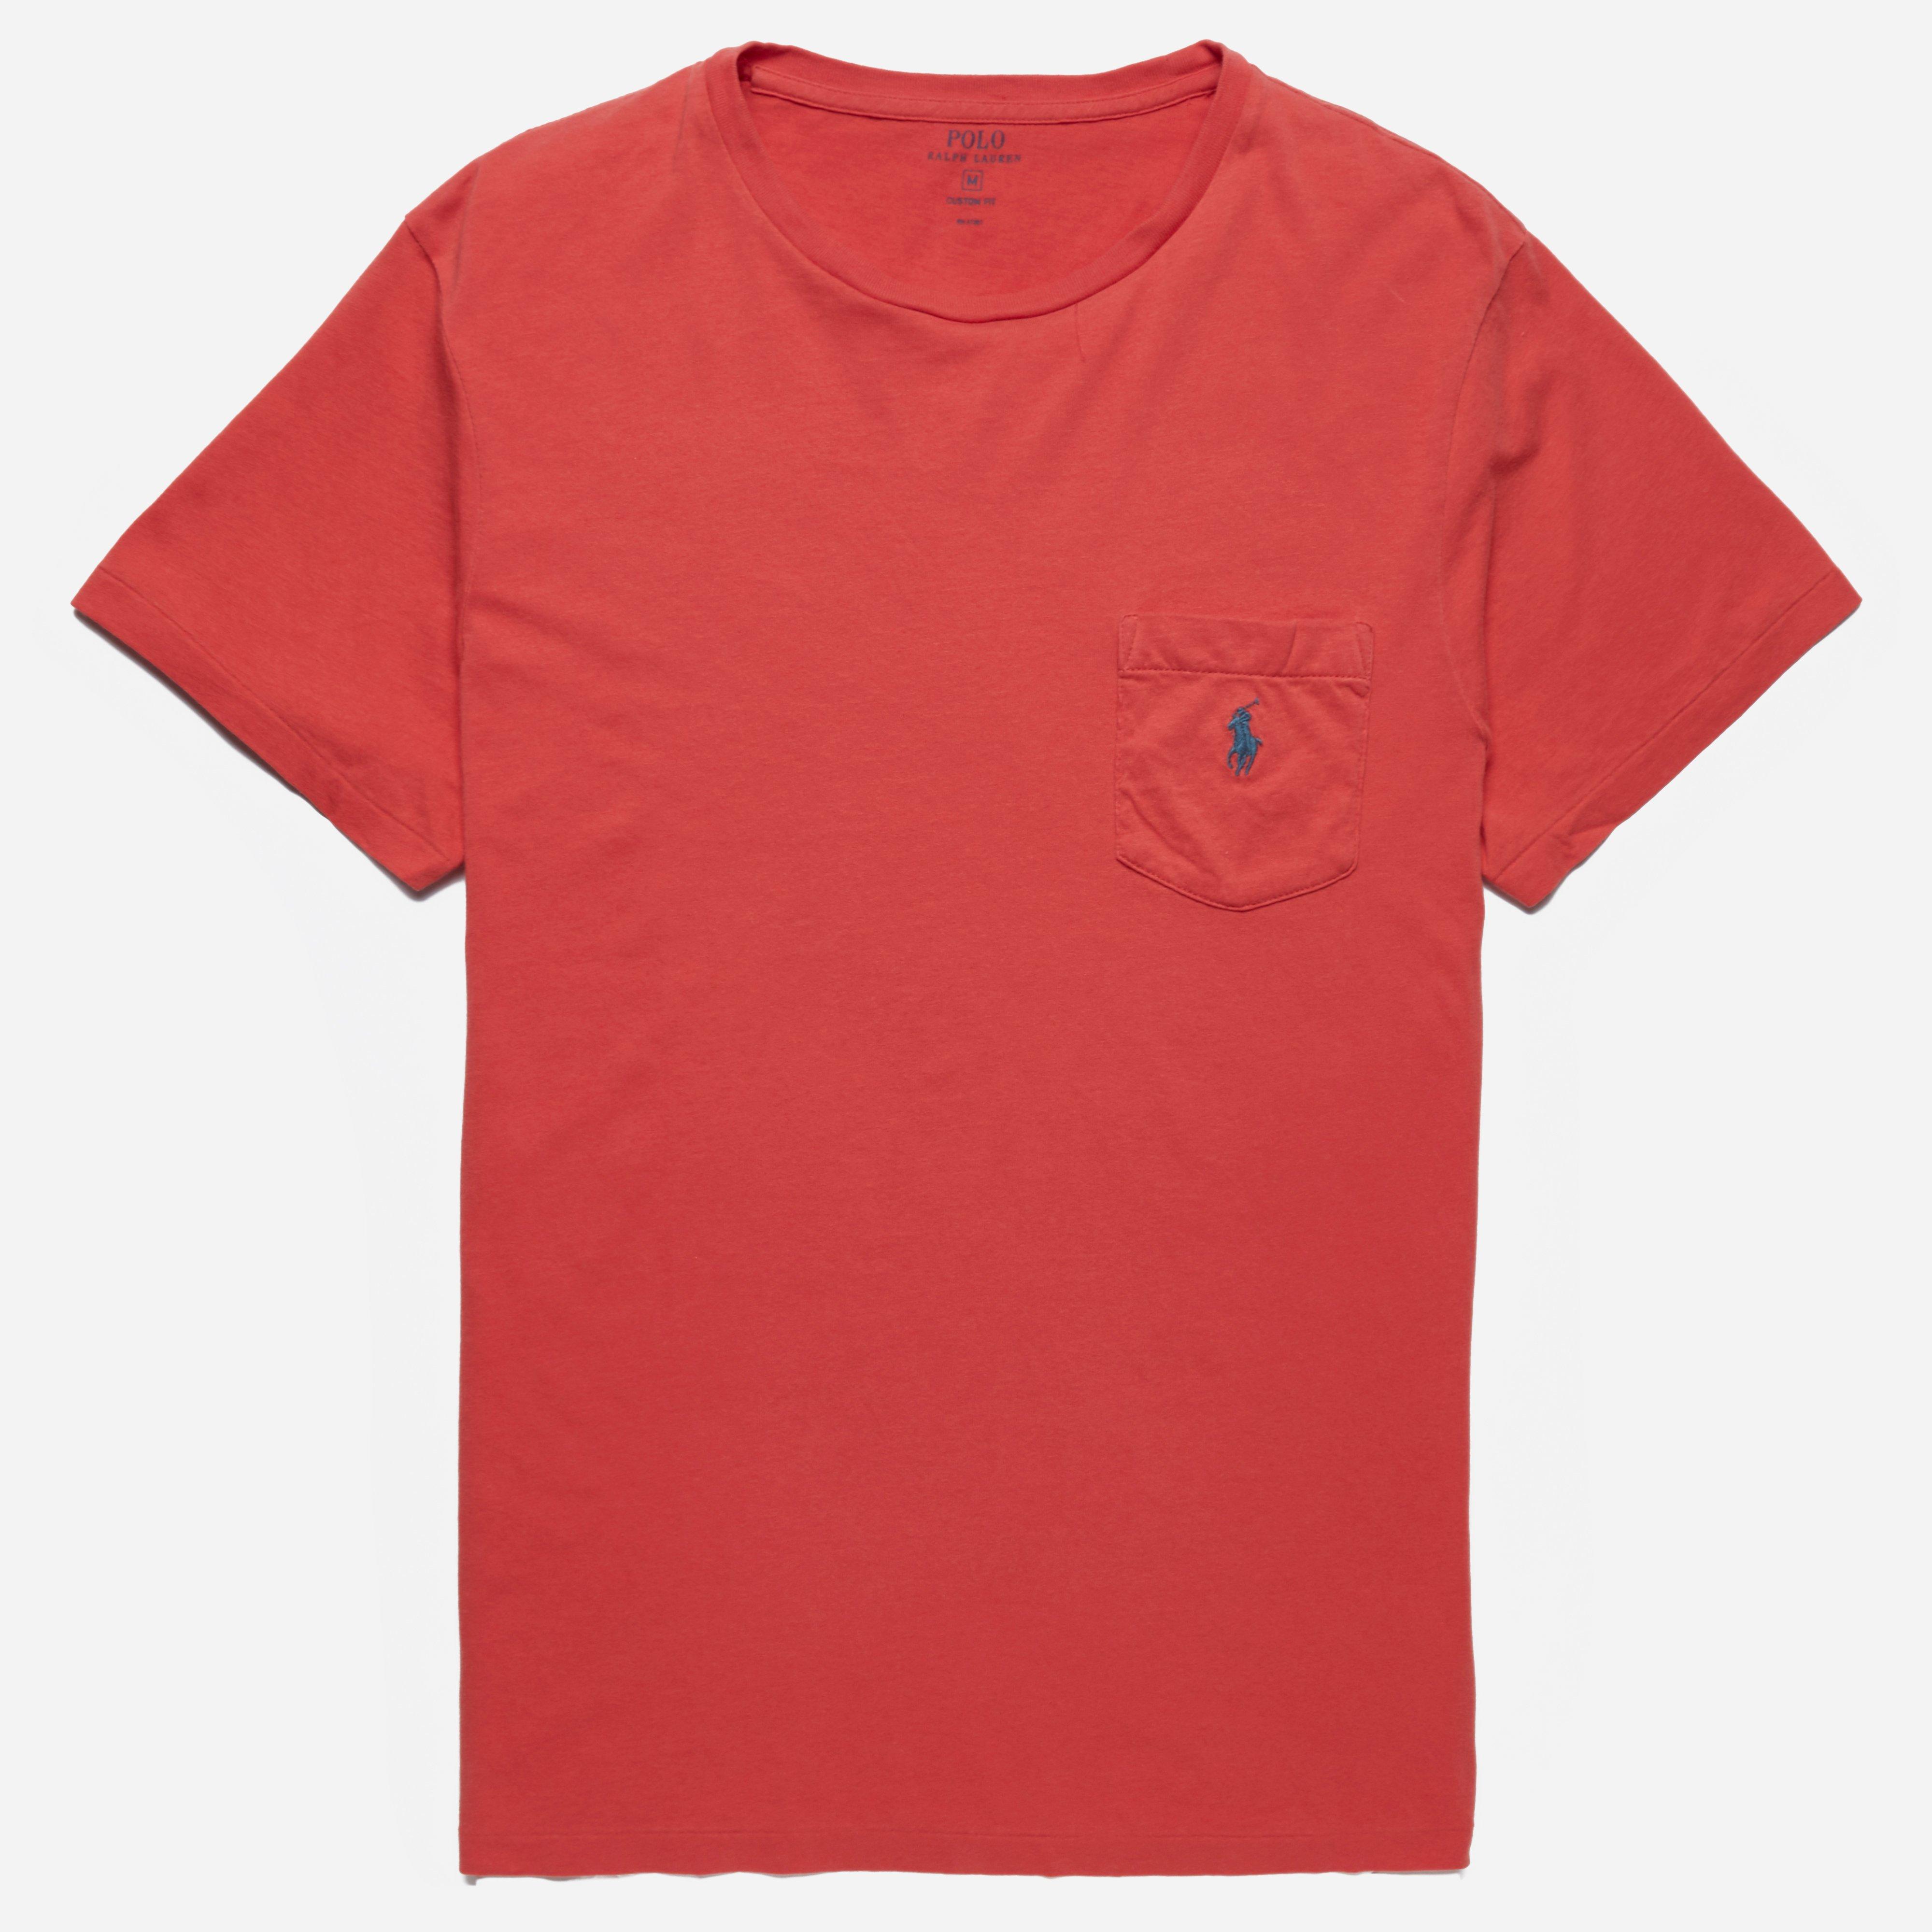 Polo Ralph Lauren Custom Fit Pocket T-shirt